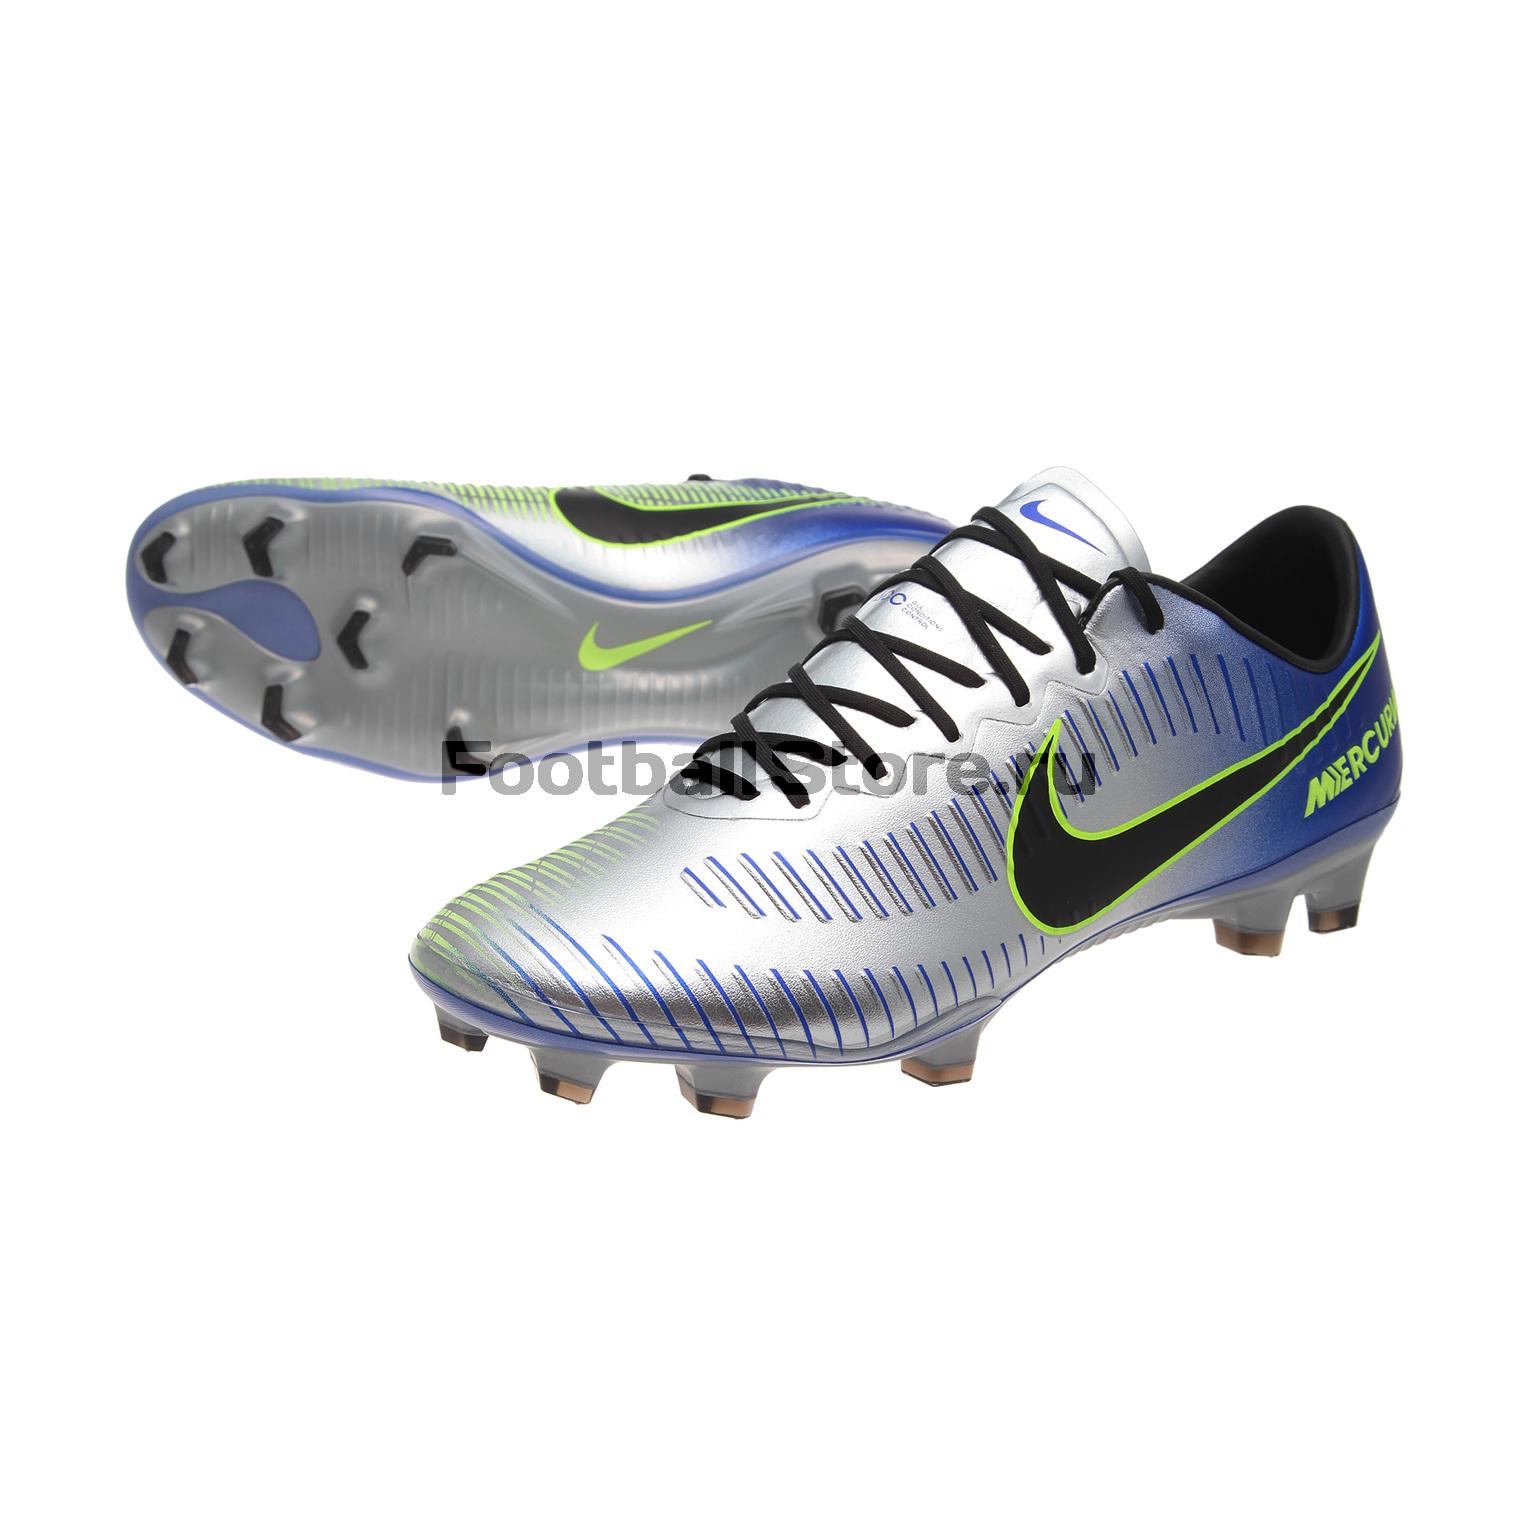 Бутсы Nike Mercurial Vapor XI Neymar FG 921547-407 бутсы футбольные nike vapor xii elite fg ah7380 081 sr черн оранж